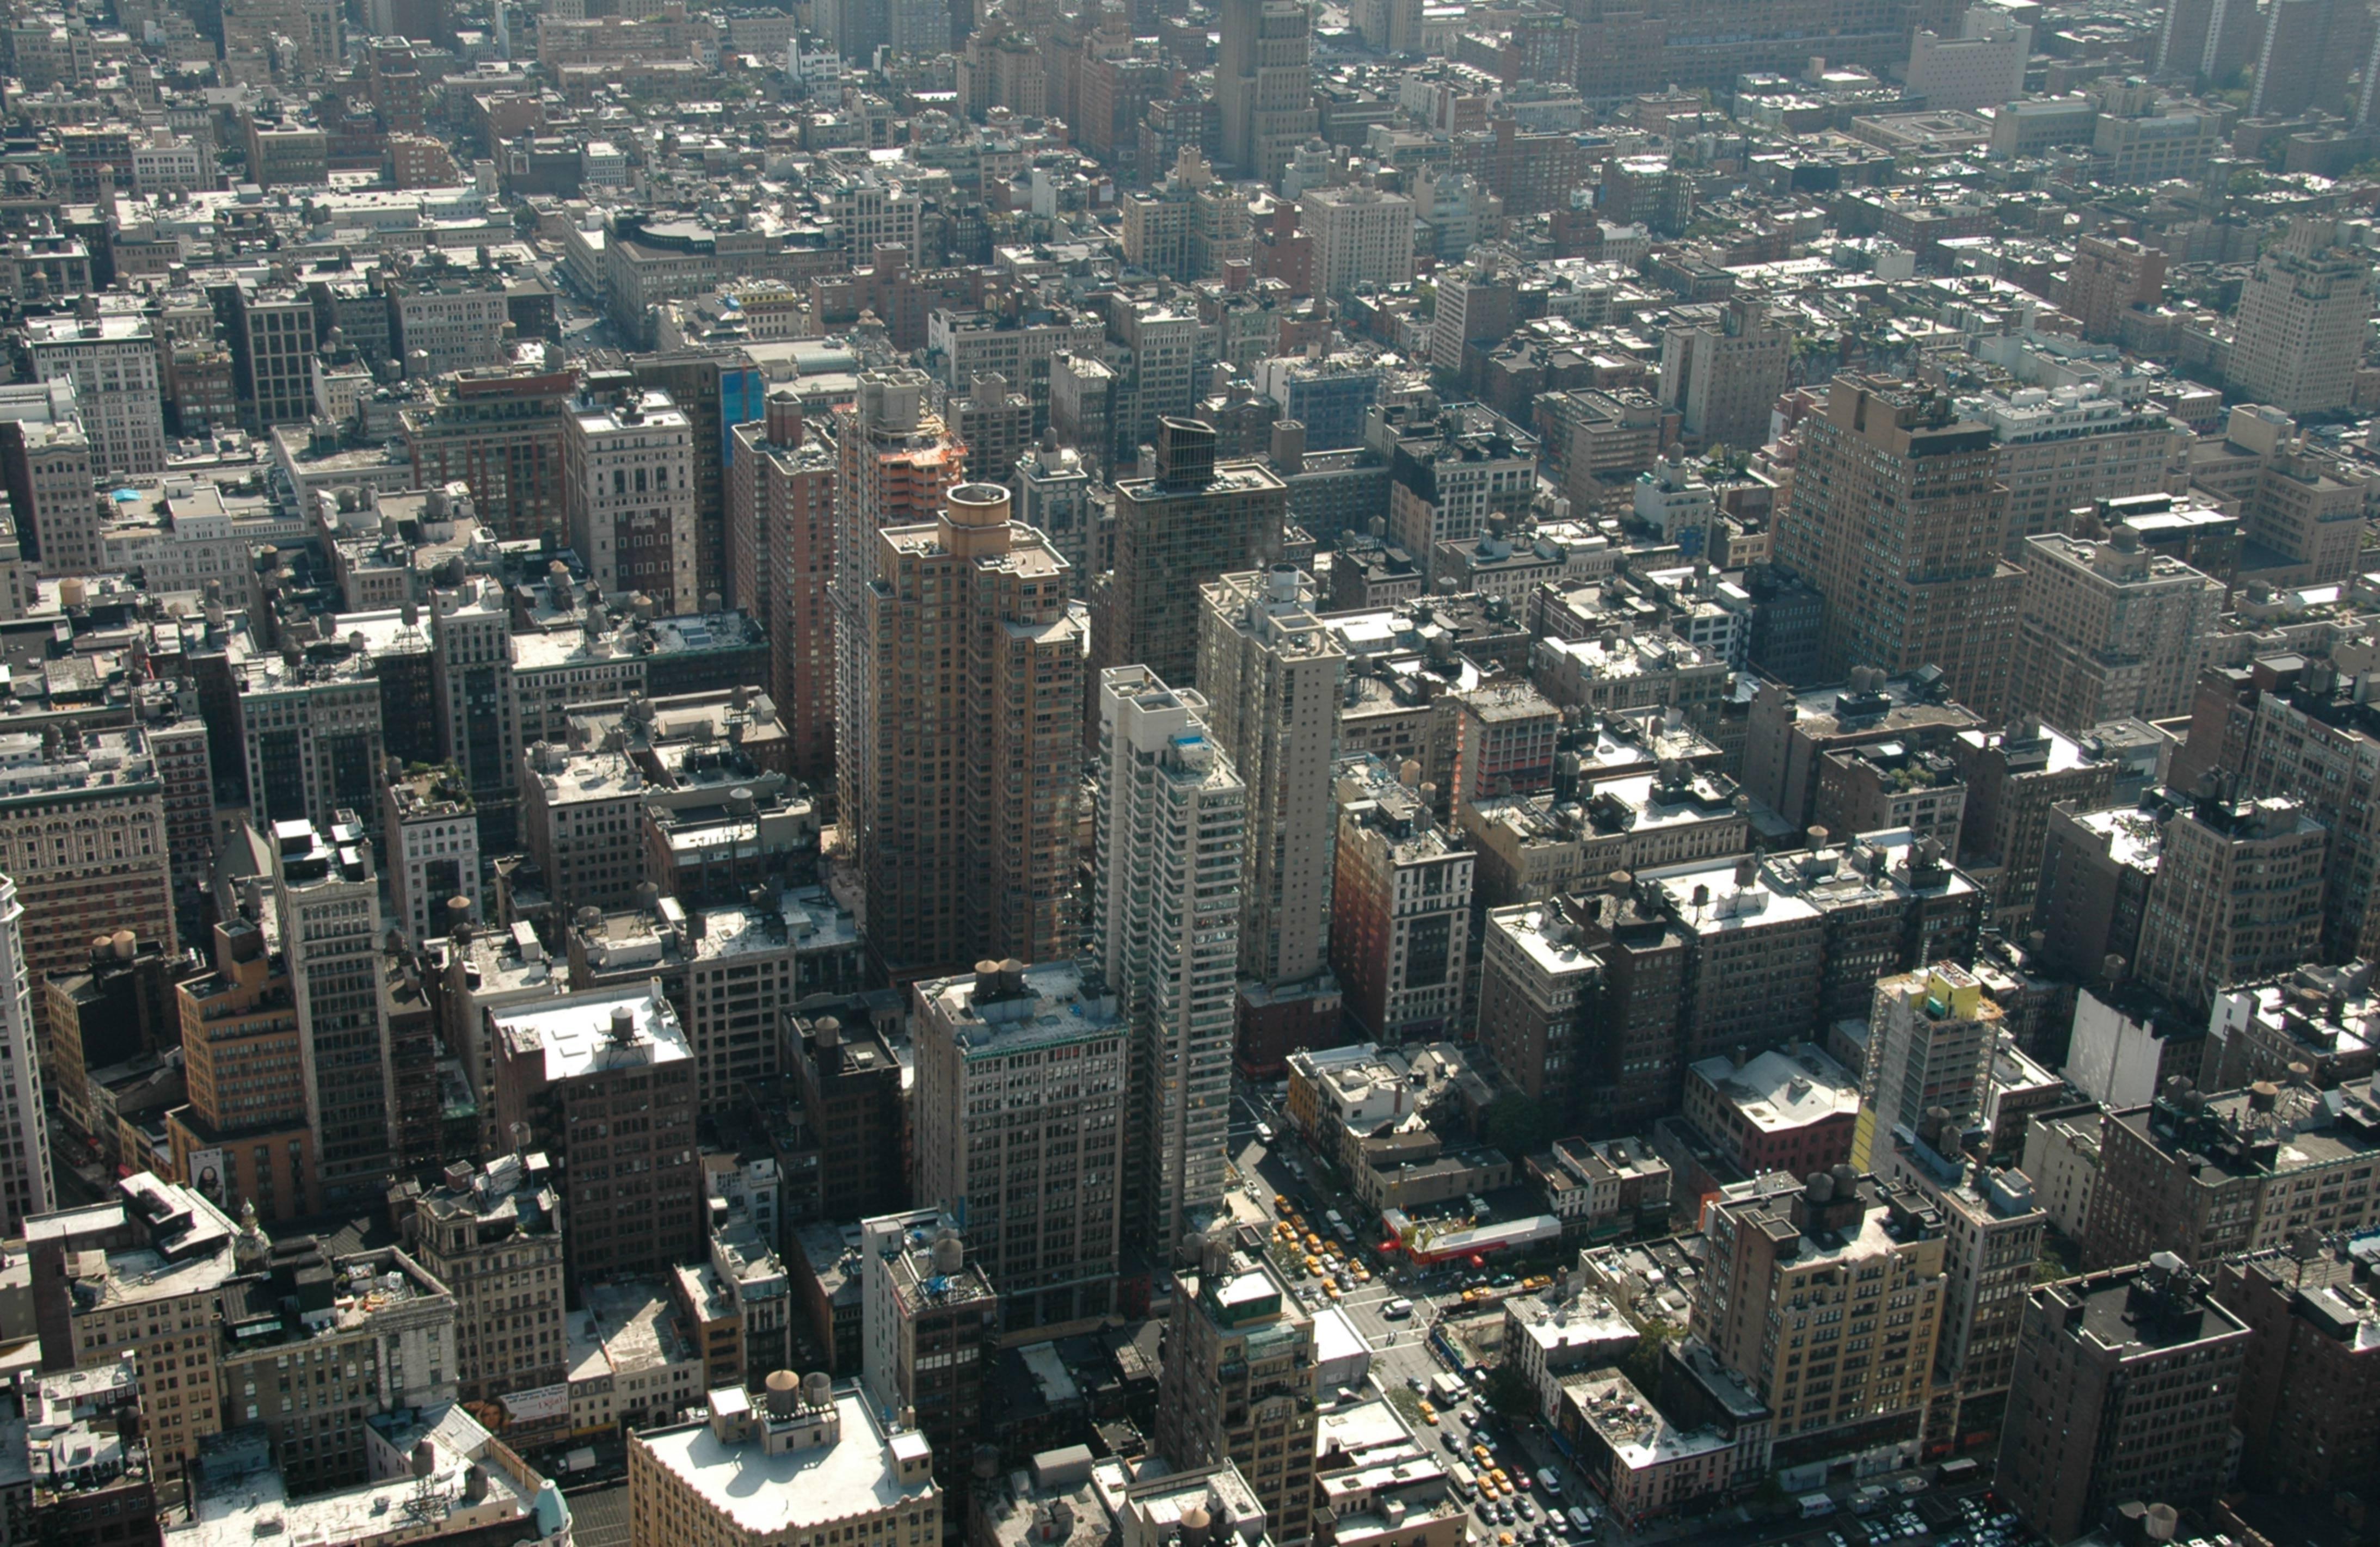 Concrete Jungle New York City